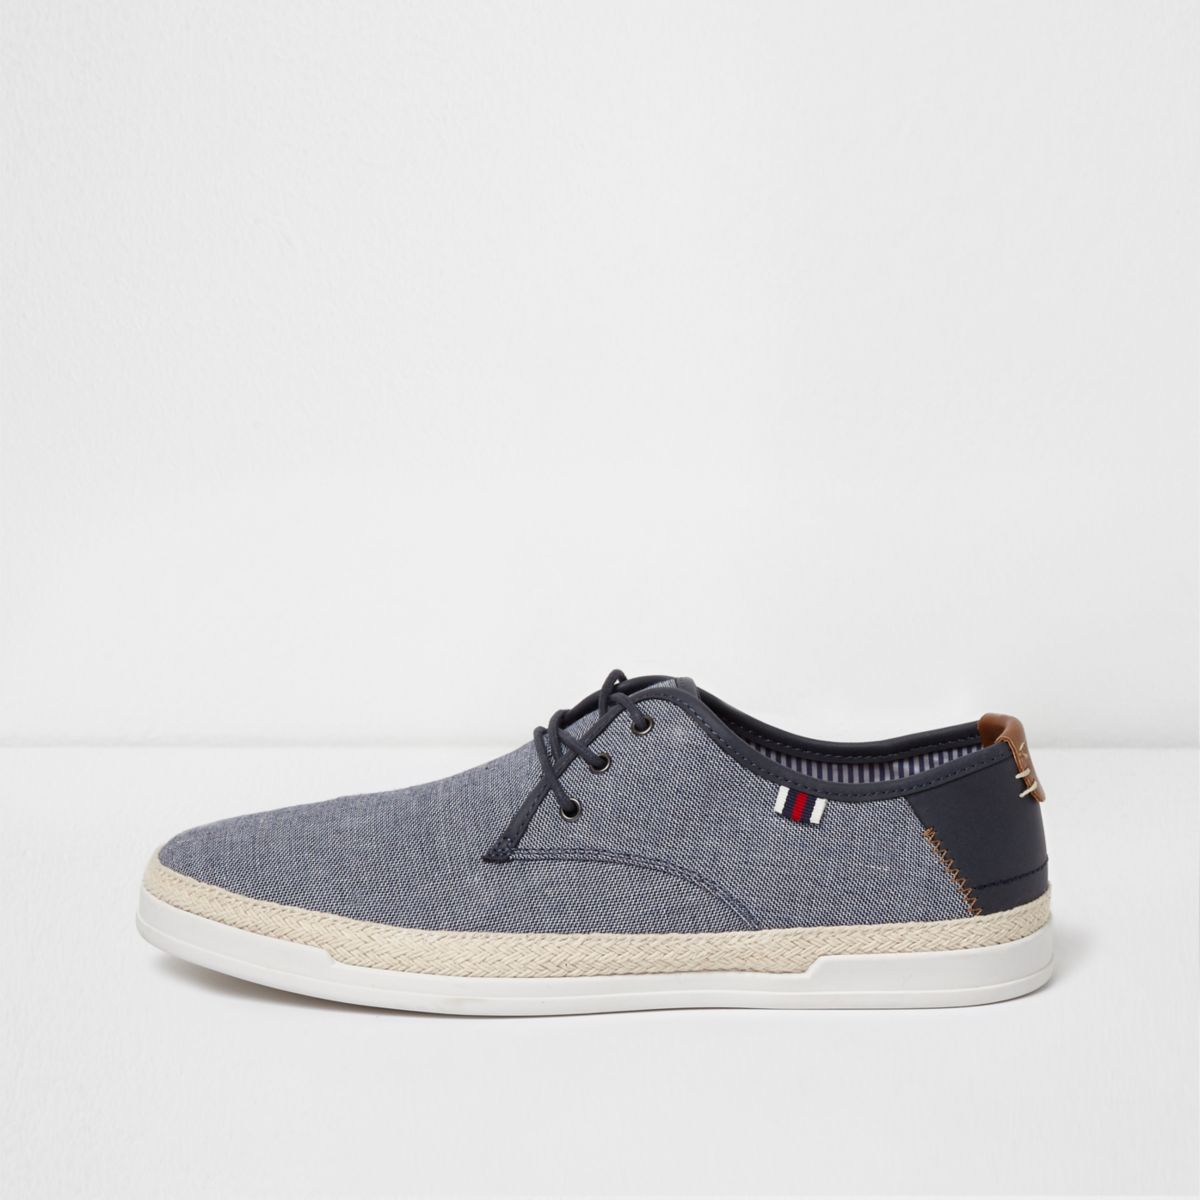 Blue espadrille trim lace-up sneakers